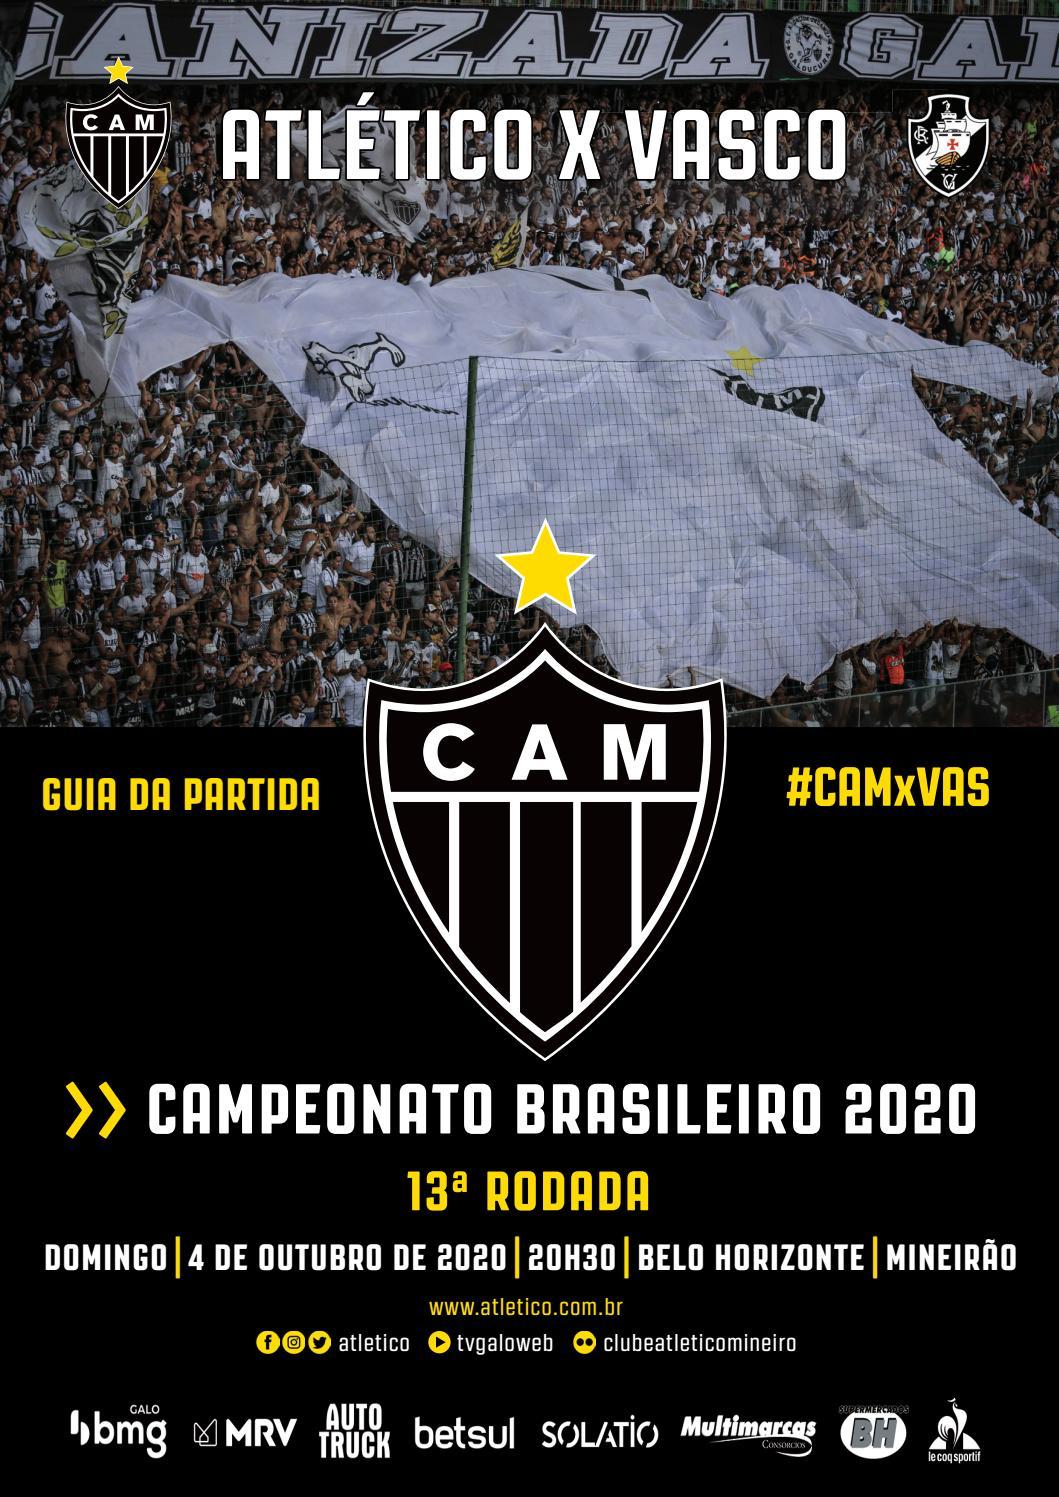 Guia Da Partida Atletico X Vasco Brasileirao 2020 13ª Rodada By Clube Atletico Mineiro Issuu